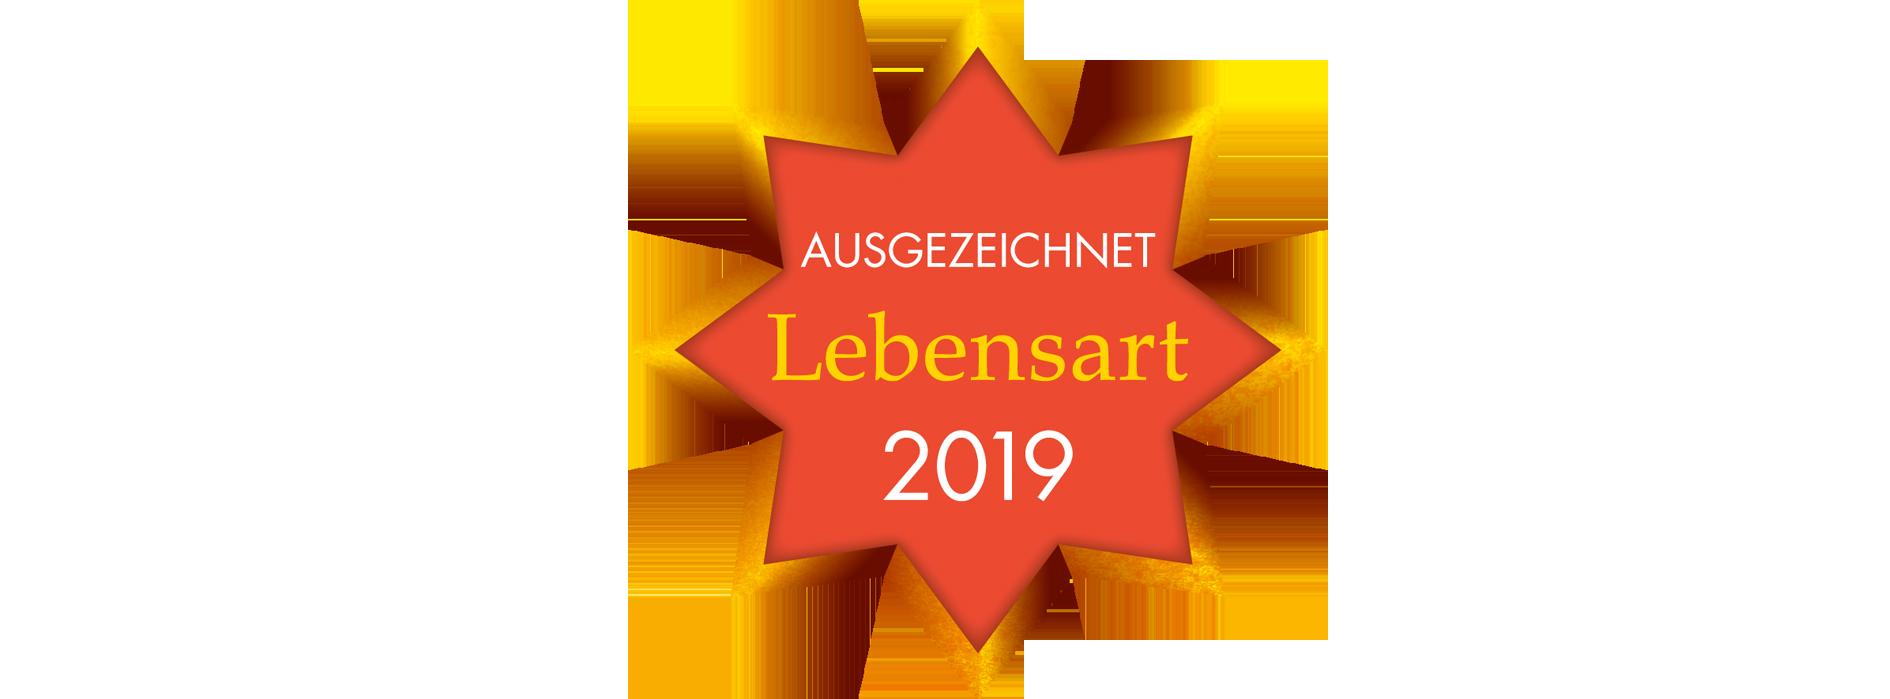 Lebensart-Auszeichnung-2019.png